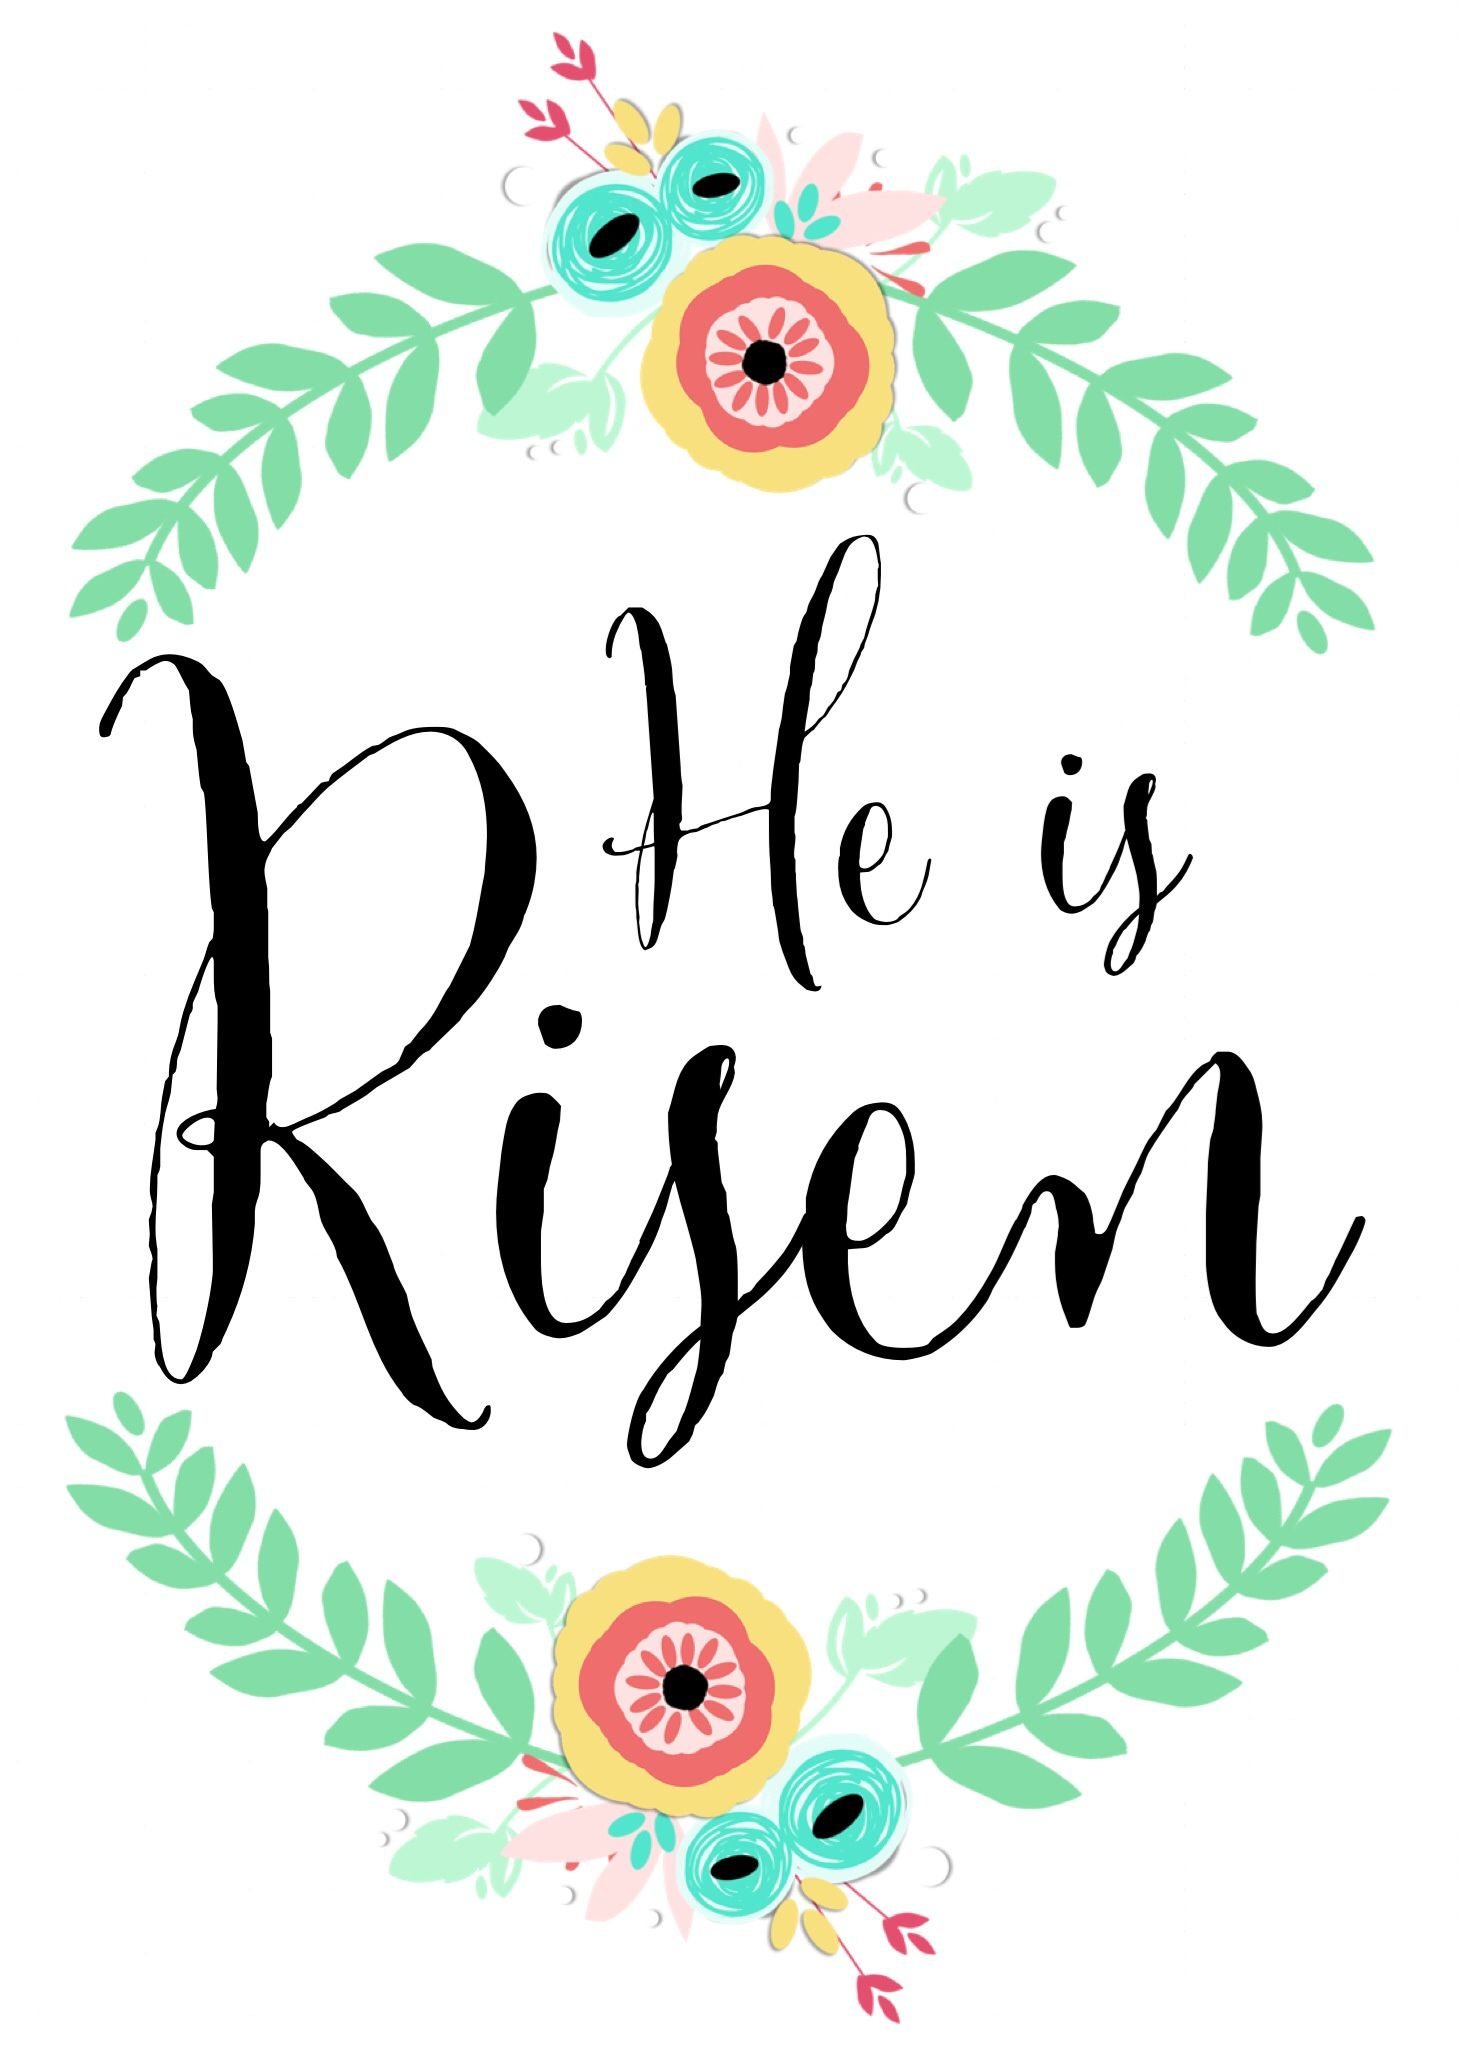 medium resolution of jesus is risen he is risen sign risen christ he has risen